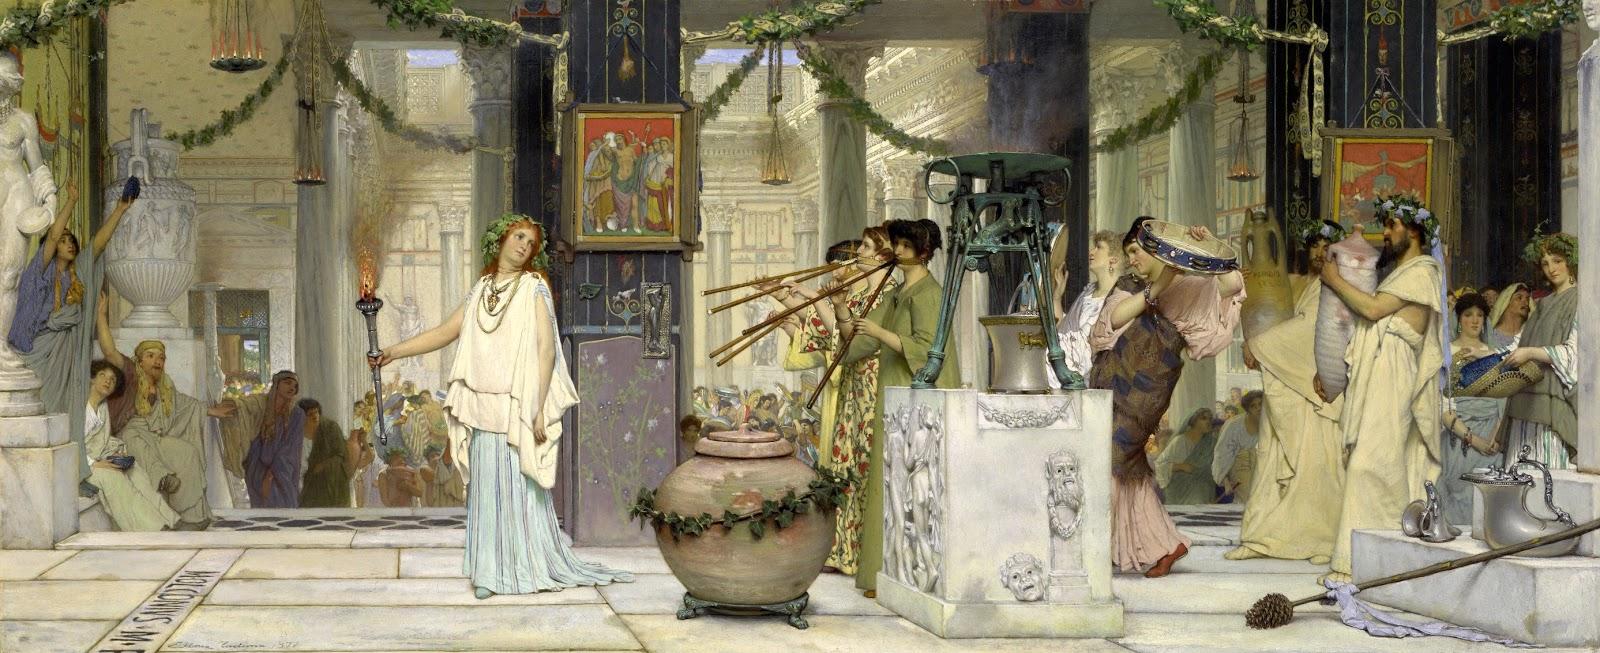 Lawrence Alma-Tadema - Page 2 2+Lawrence_Alma-Tadema_-_The_vintage_festival_-_